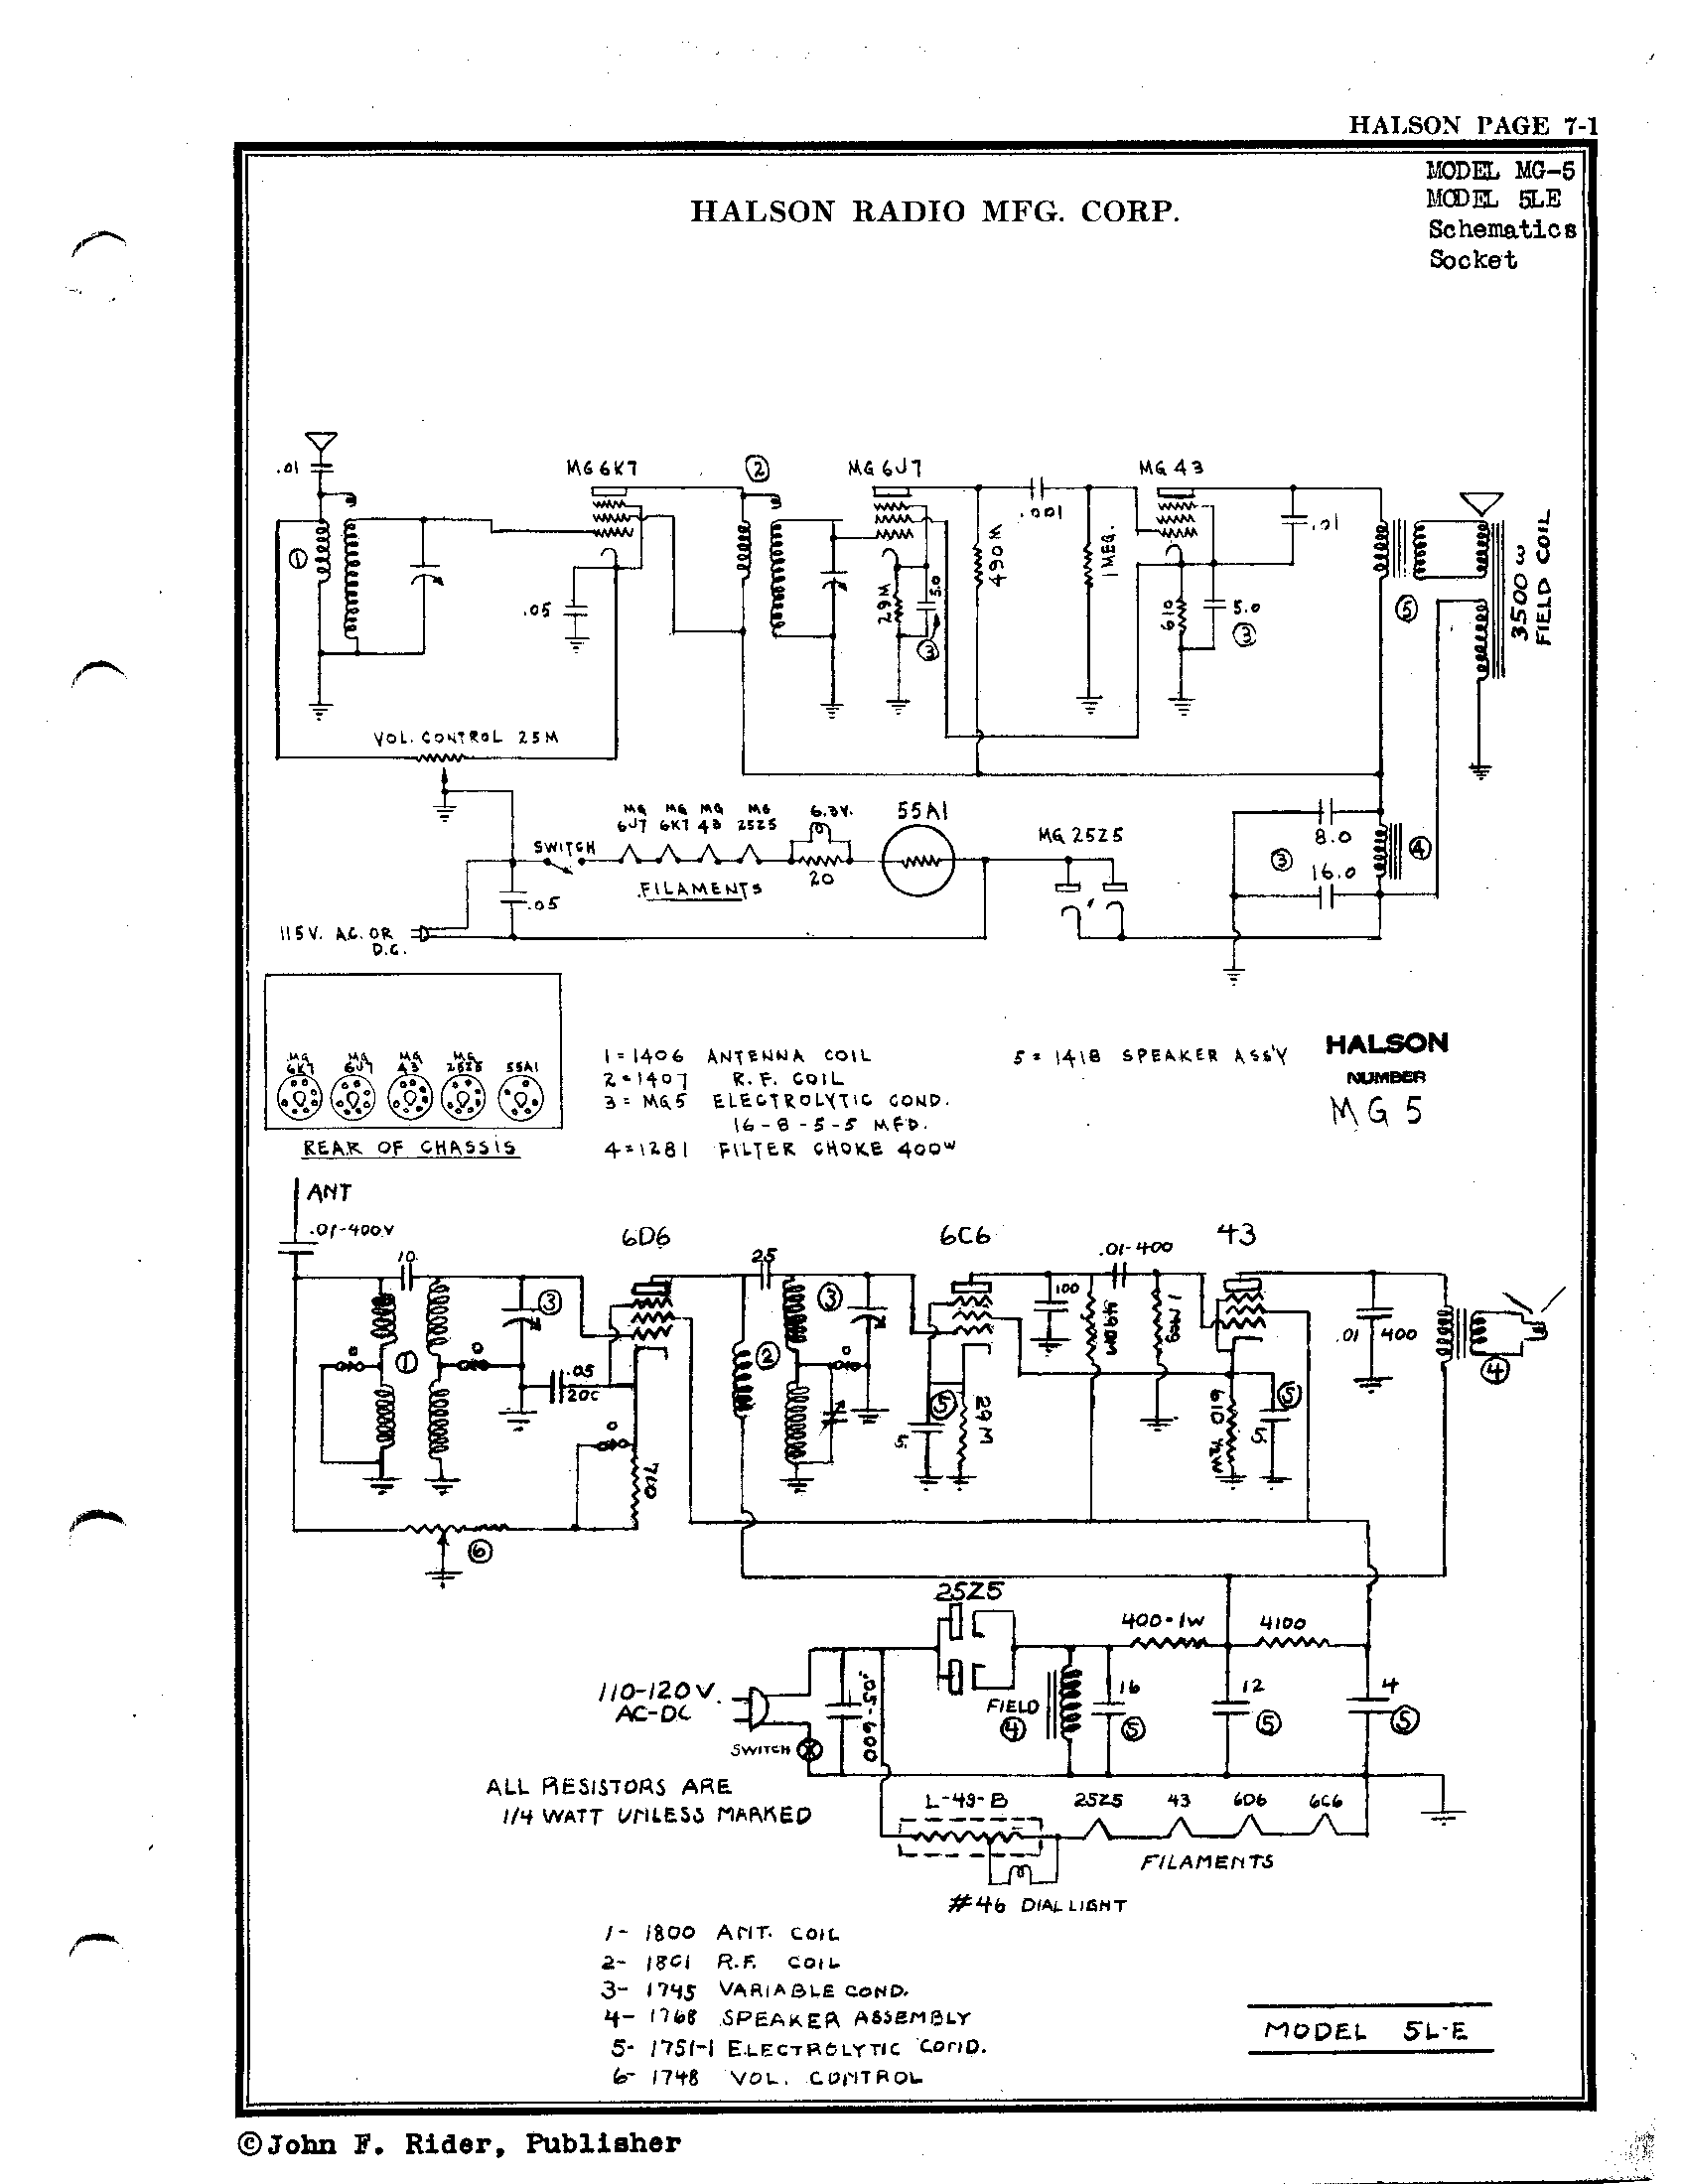 halson radio corp mg 5 schematic Electromechanical Diagram mg 5 schematic